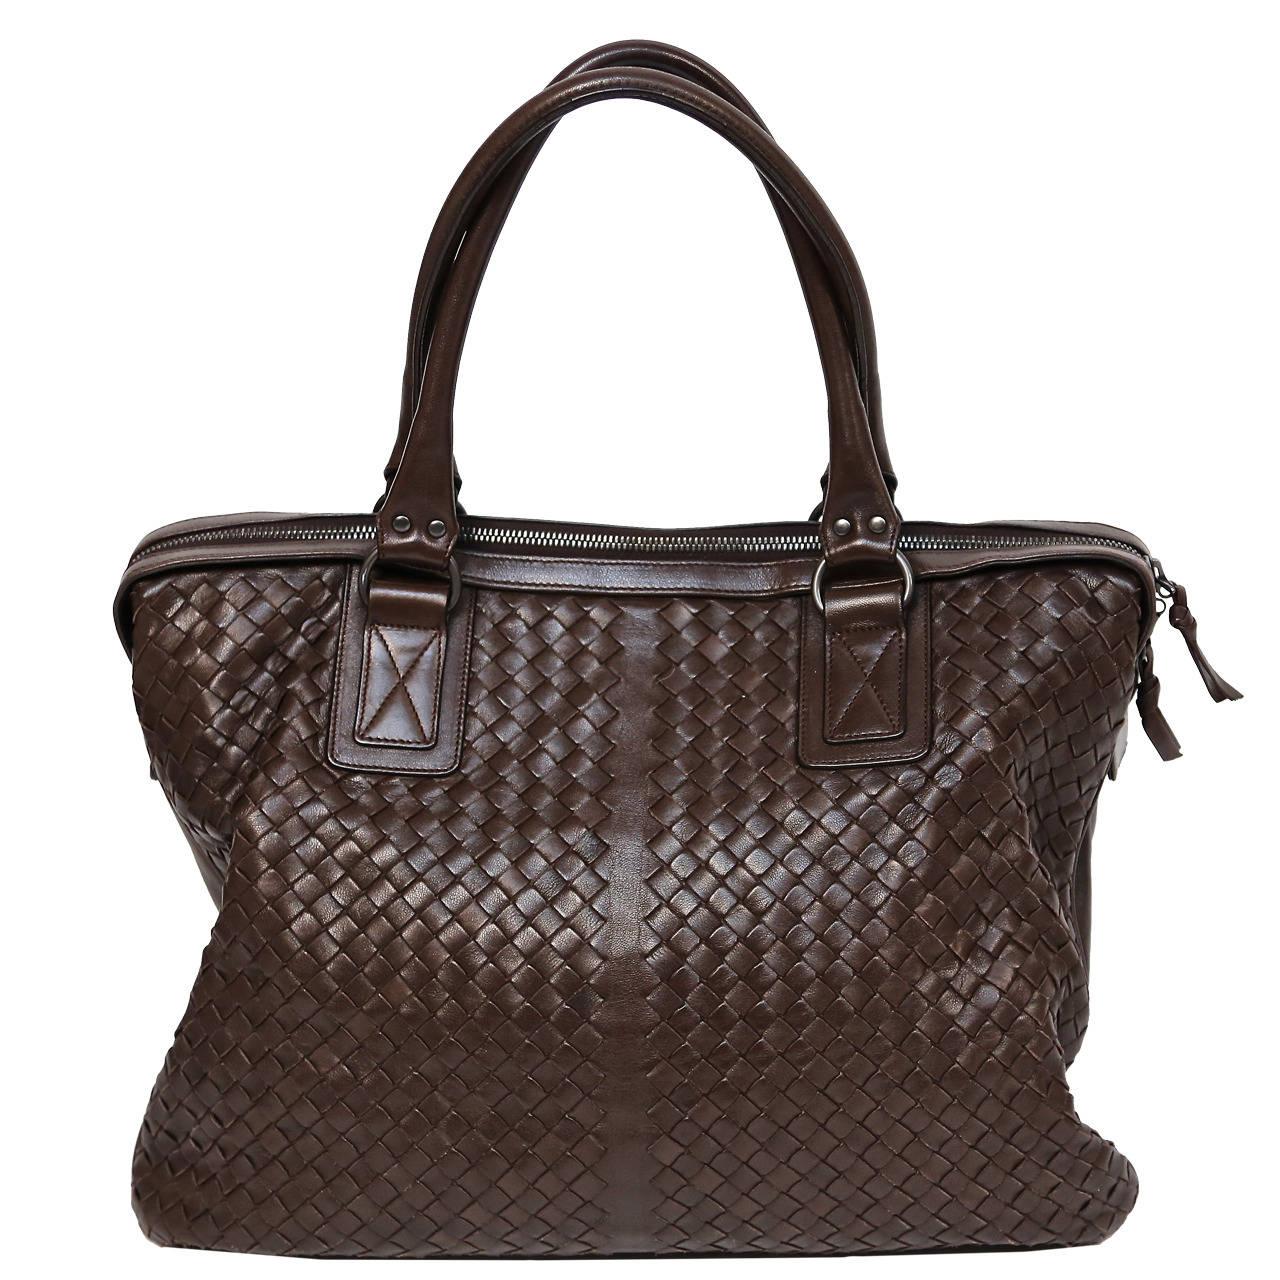 BOTTEGA VENETA oversized brown intrecciato woven leather tote bag 1